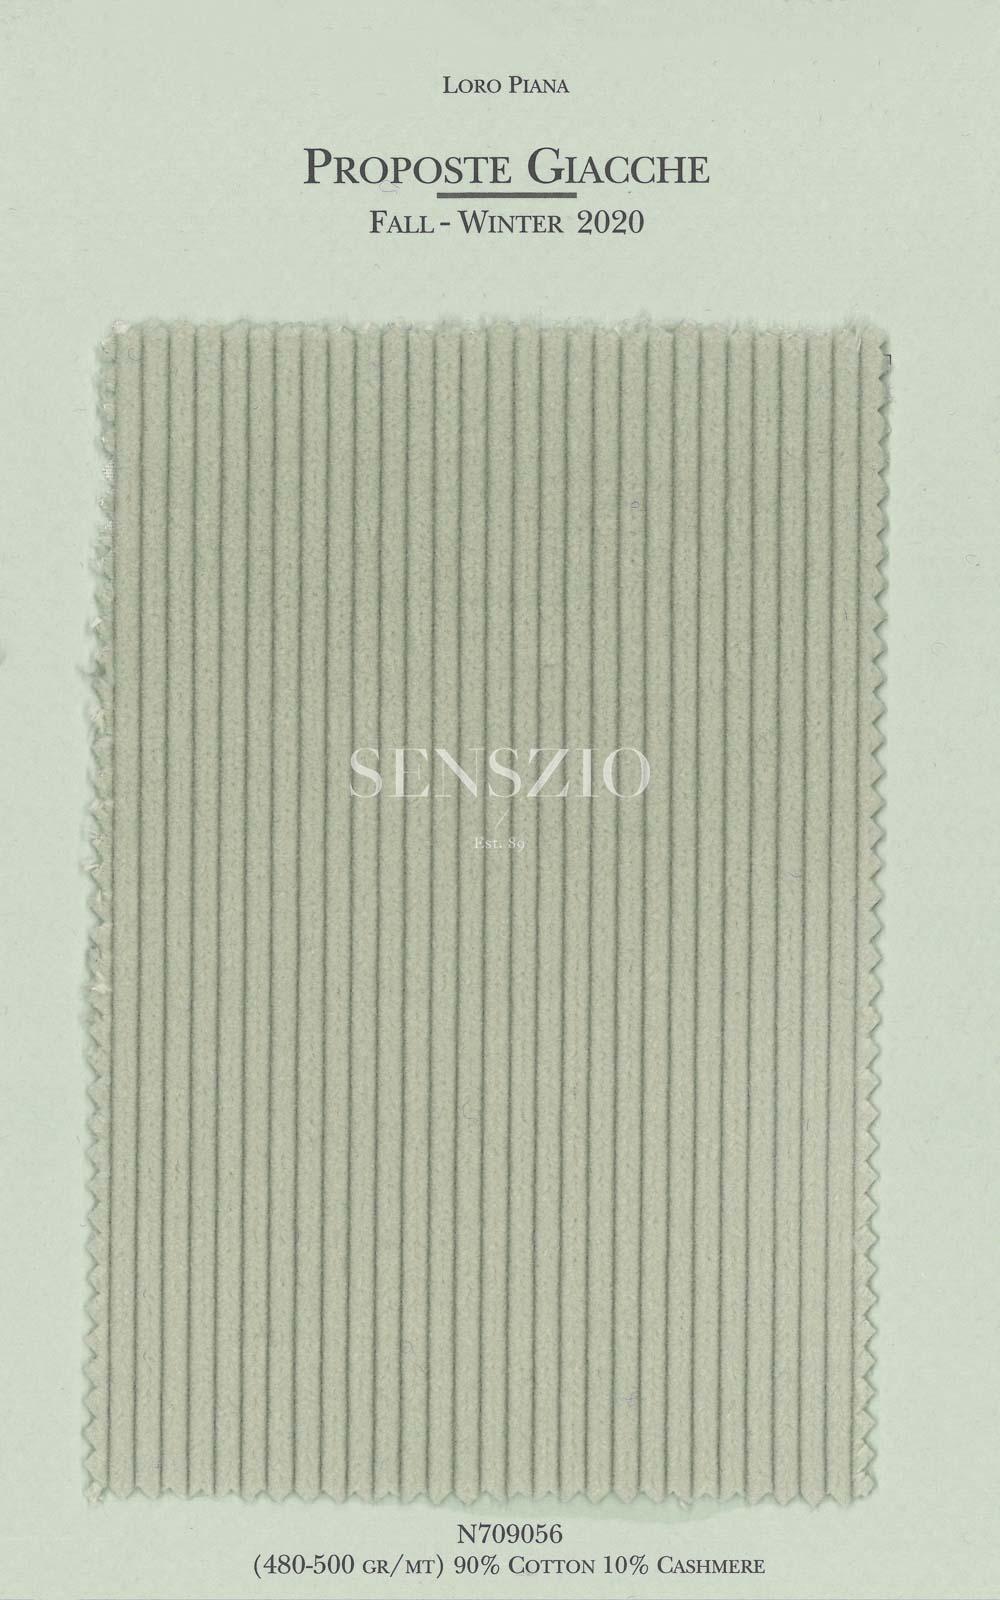 Lpn709056